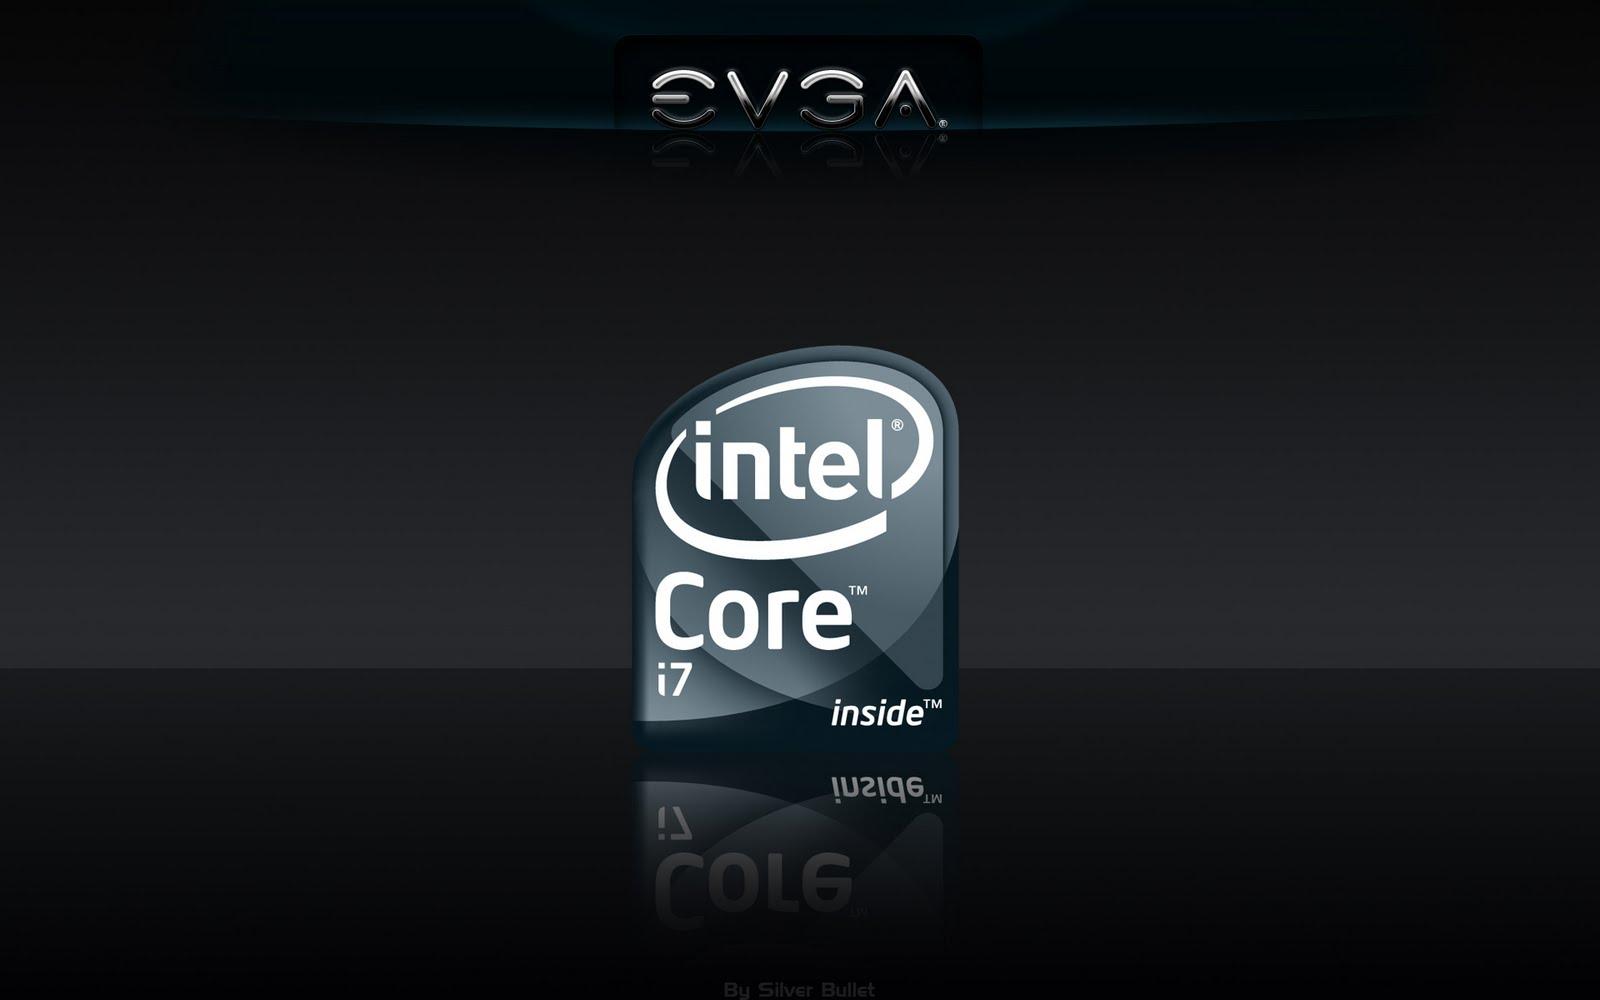 http://1.bp.blogspot.com/_D6V8KS70KD8/TJ4iaqKaCPI/AAAAAAAACsU/cgu_AFskJrU/s1600/EVGA_Core_i7_Extreme_Edition.jpg